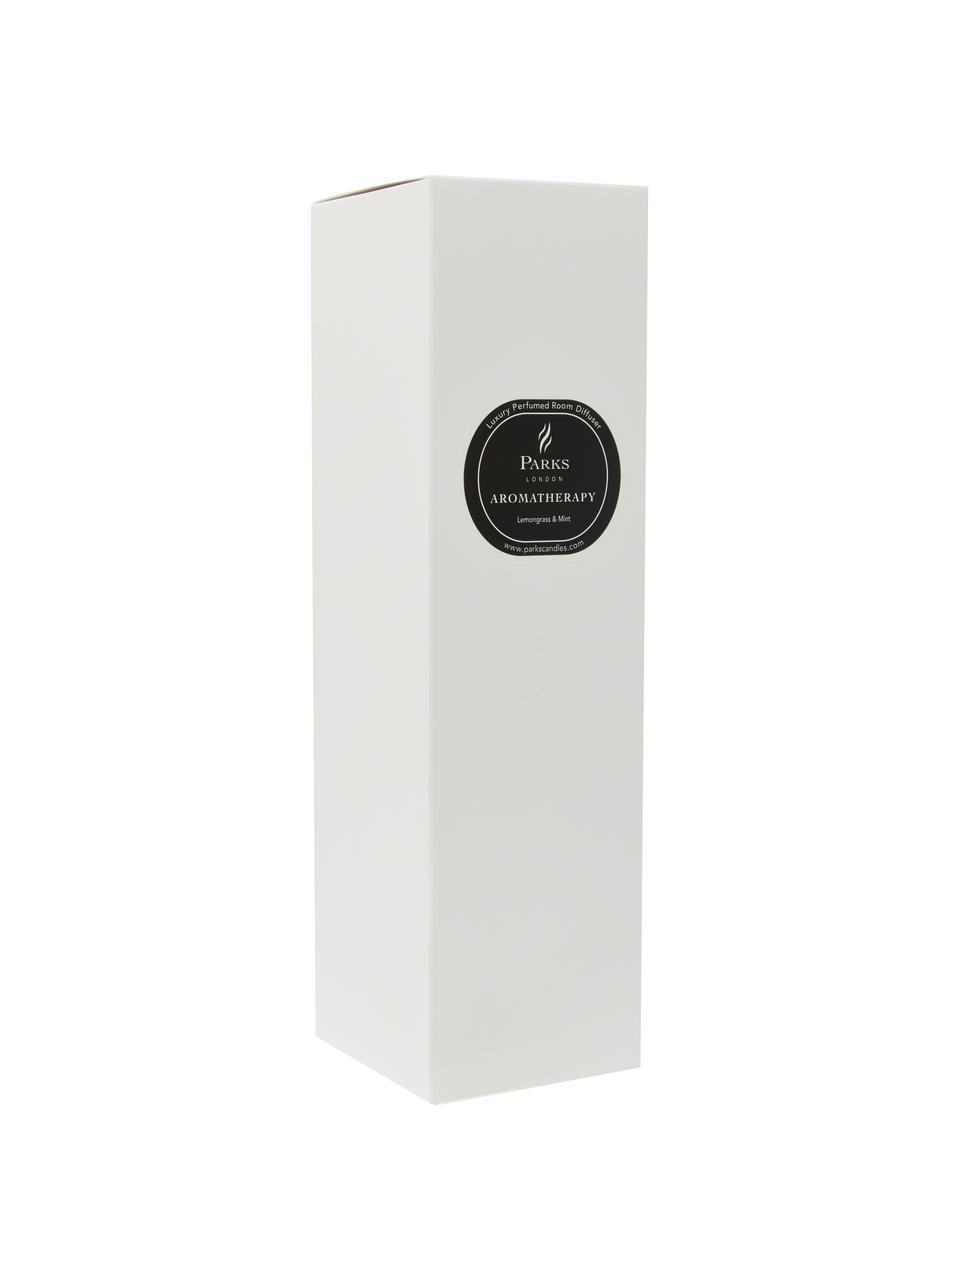 Diffuser Aromatherapy (Zitronengras & Minze), Zitronengras & Minze, Ø 6 x H 14 cm